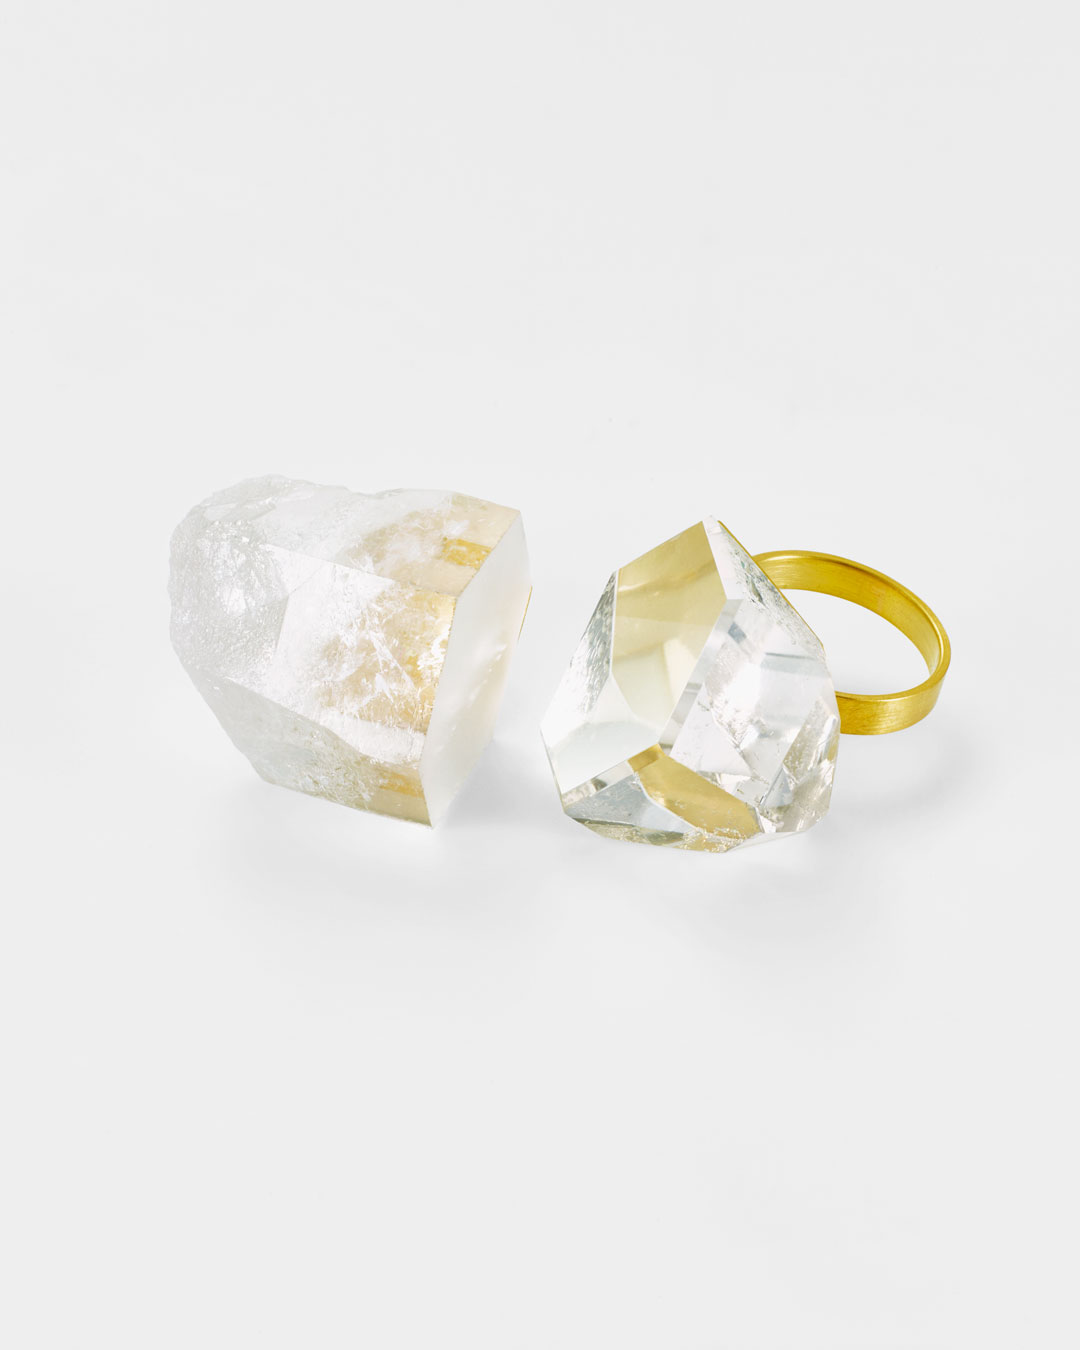 Etsuko Sonobe, untitled, 2017, ring; 20ct gold, rock crystal, 50 x 35 x 25 mm, €2200